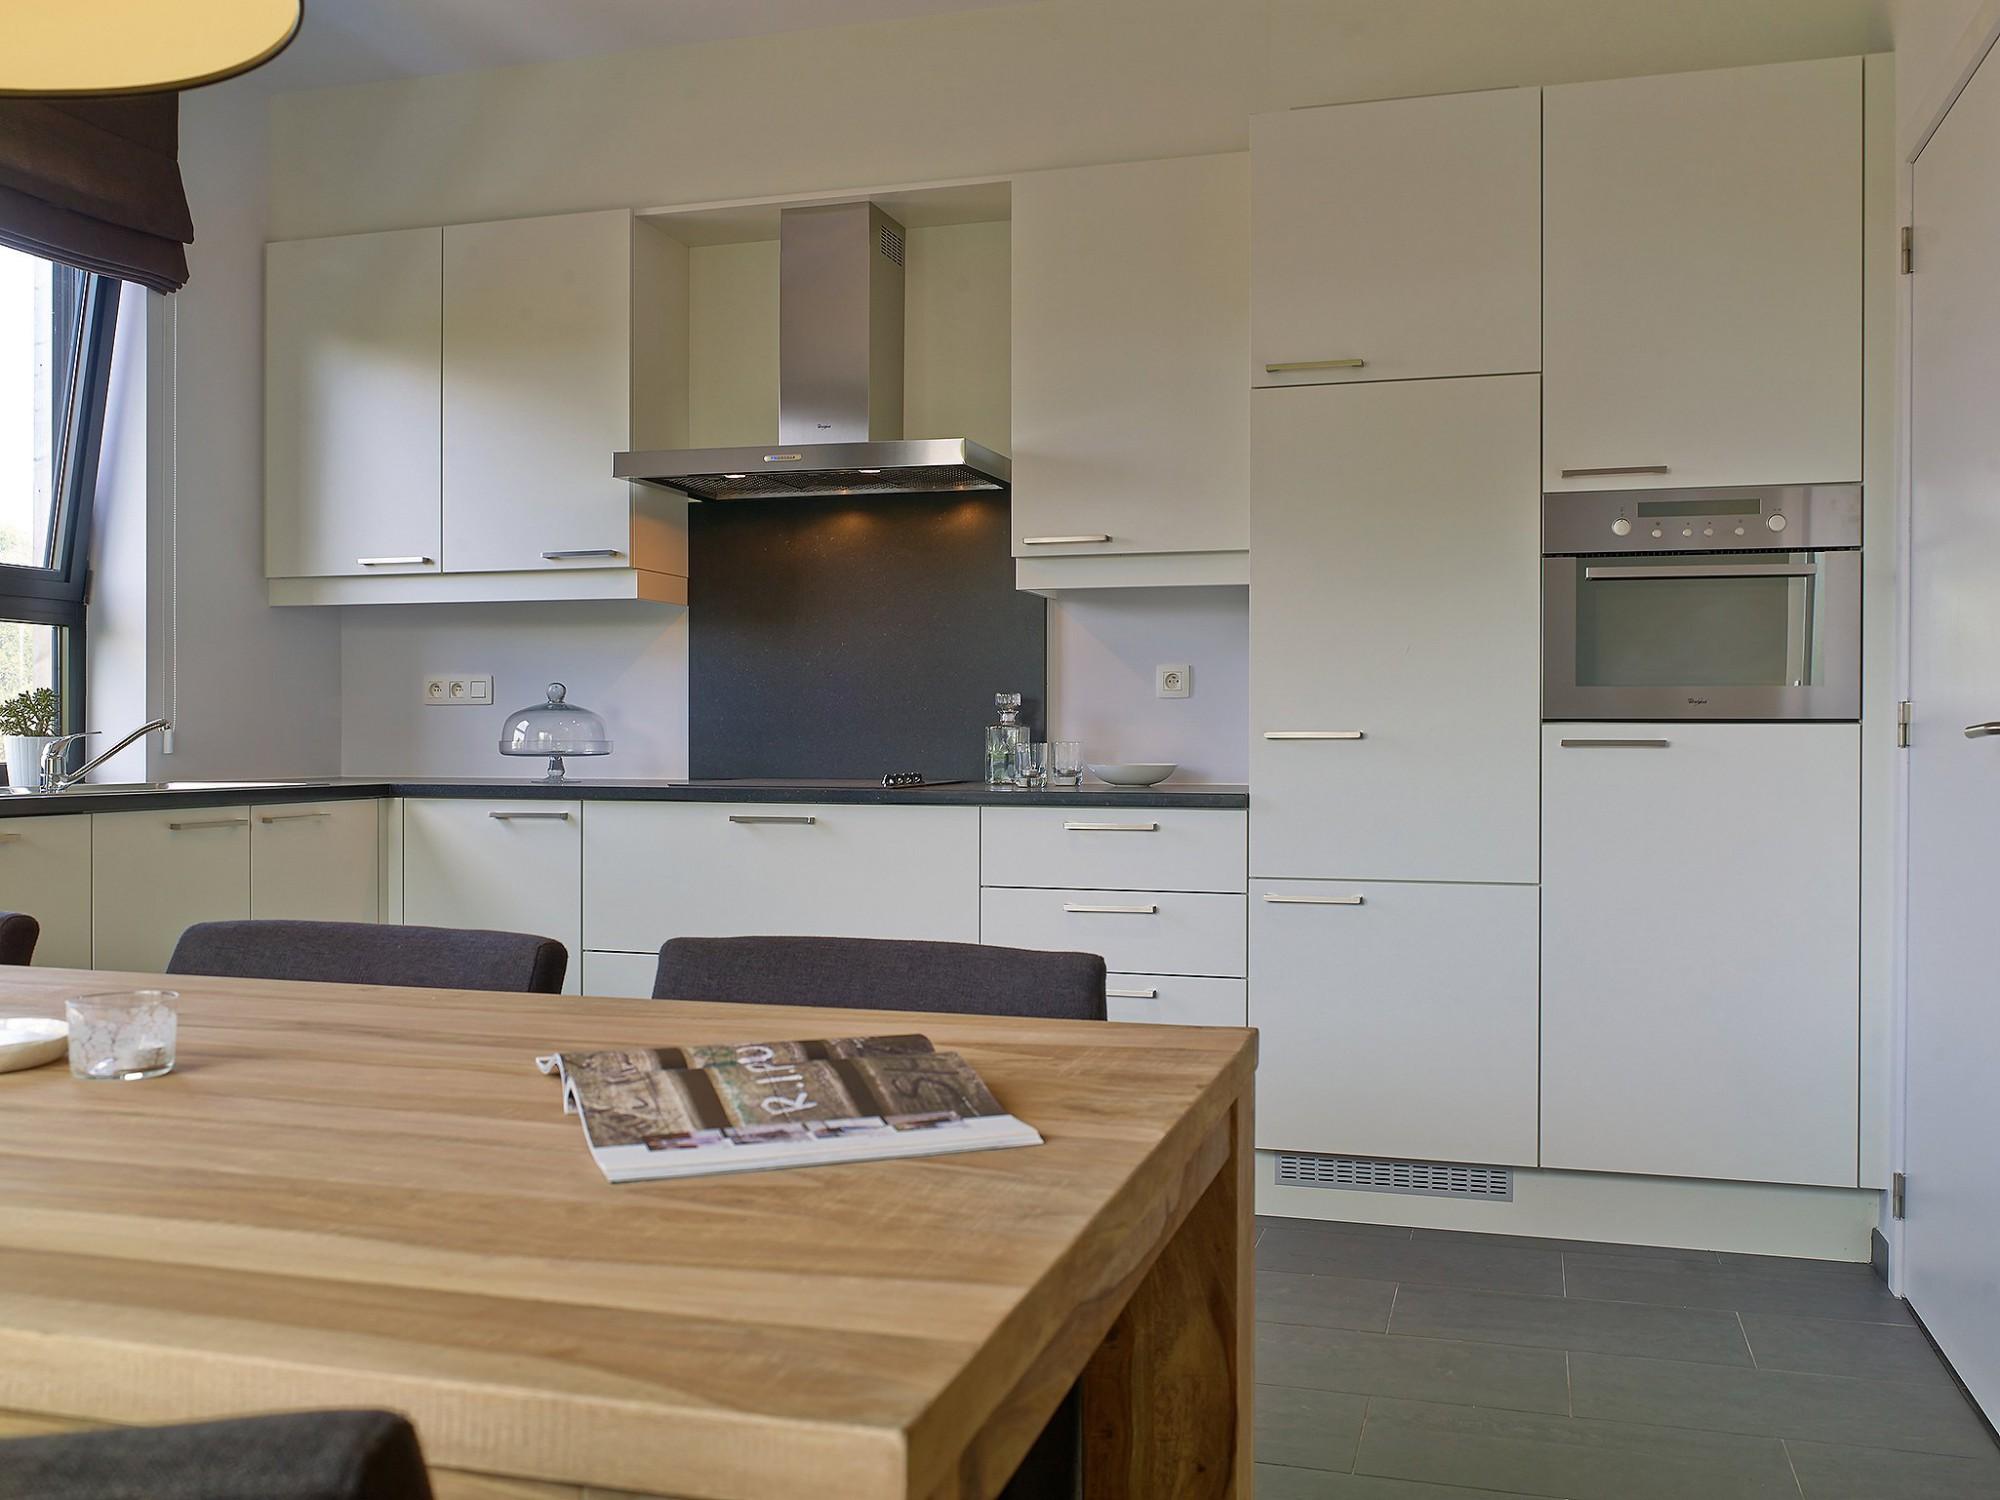 Afbeelding: Fotografie interieur keuken modelappartement CW projects.